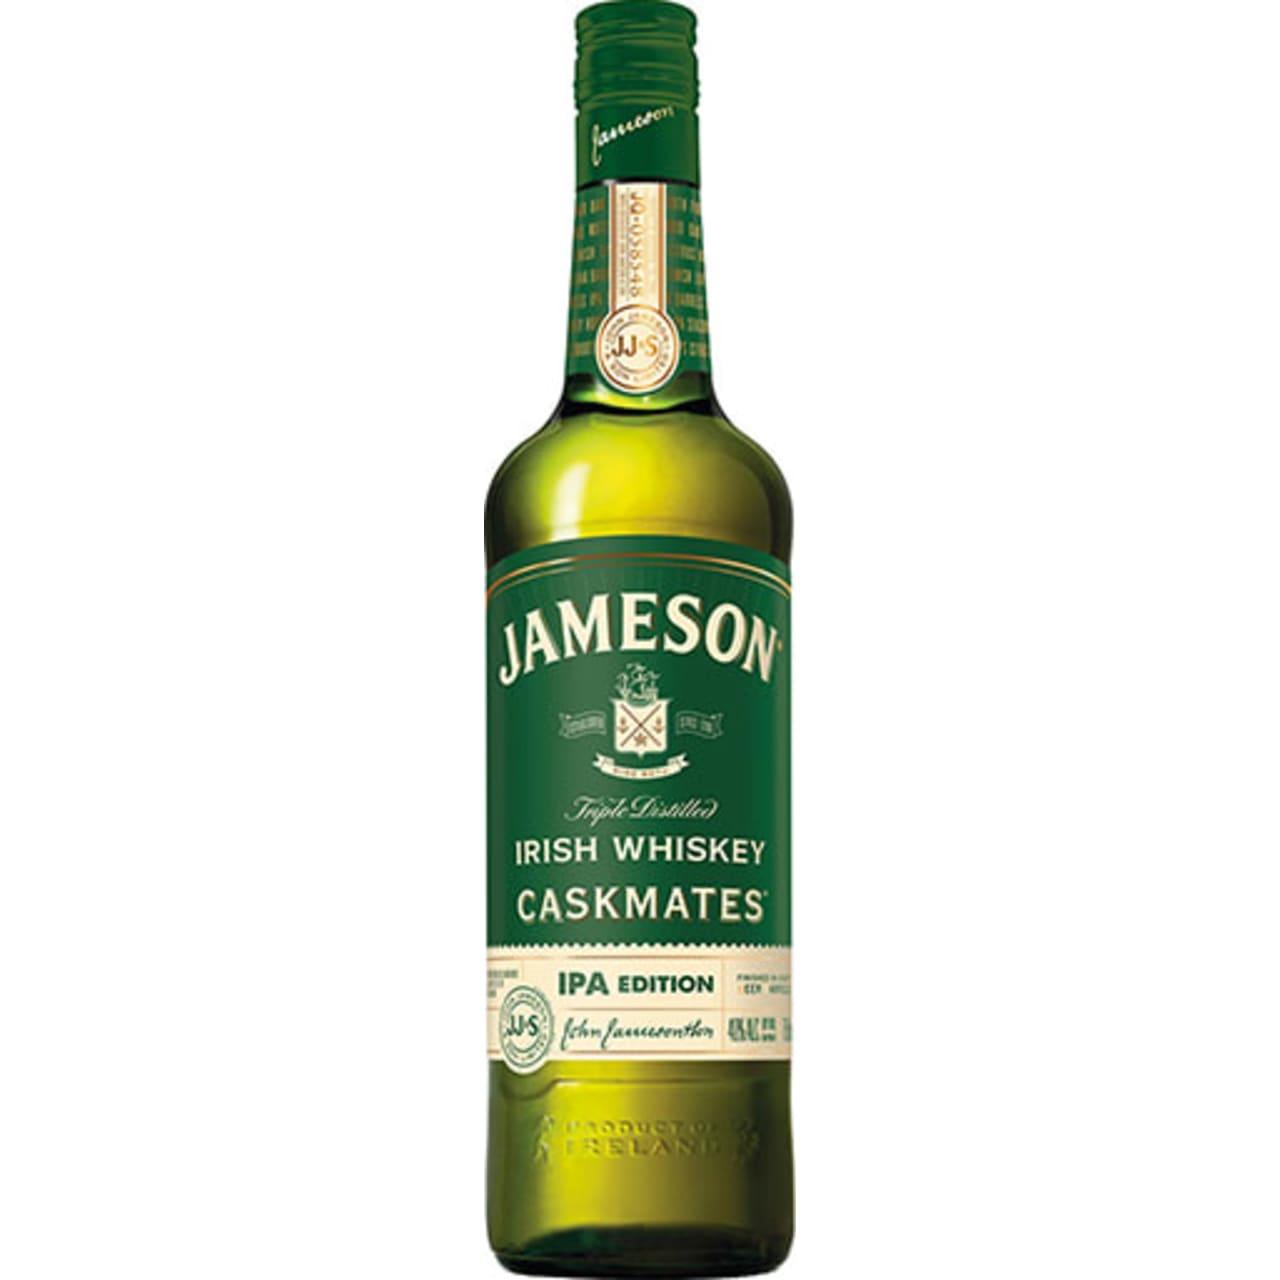 Product Image - Jameson Caskmates IPA Edition Whiskey